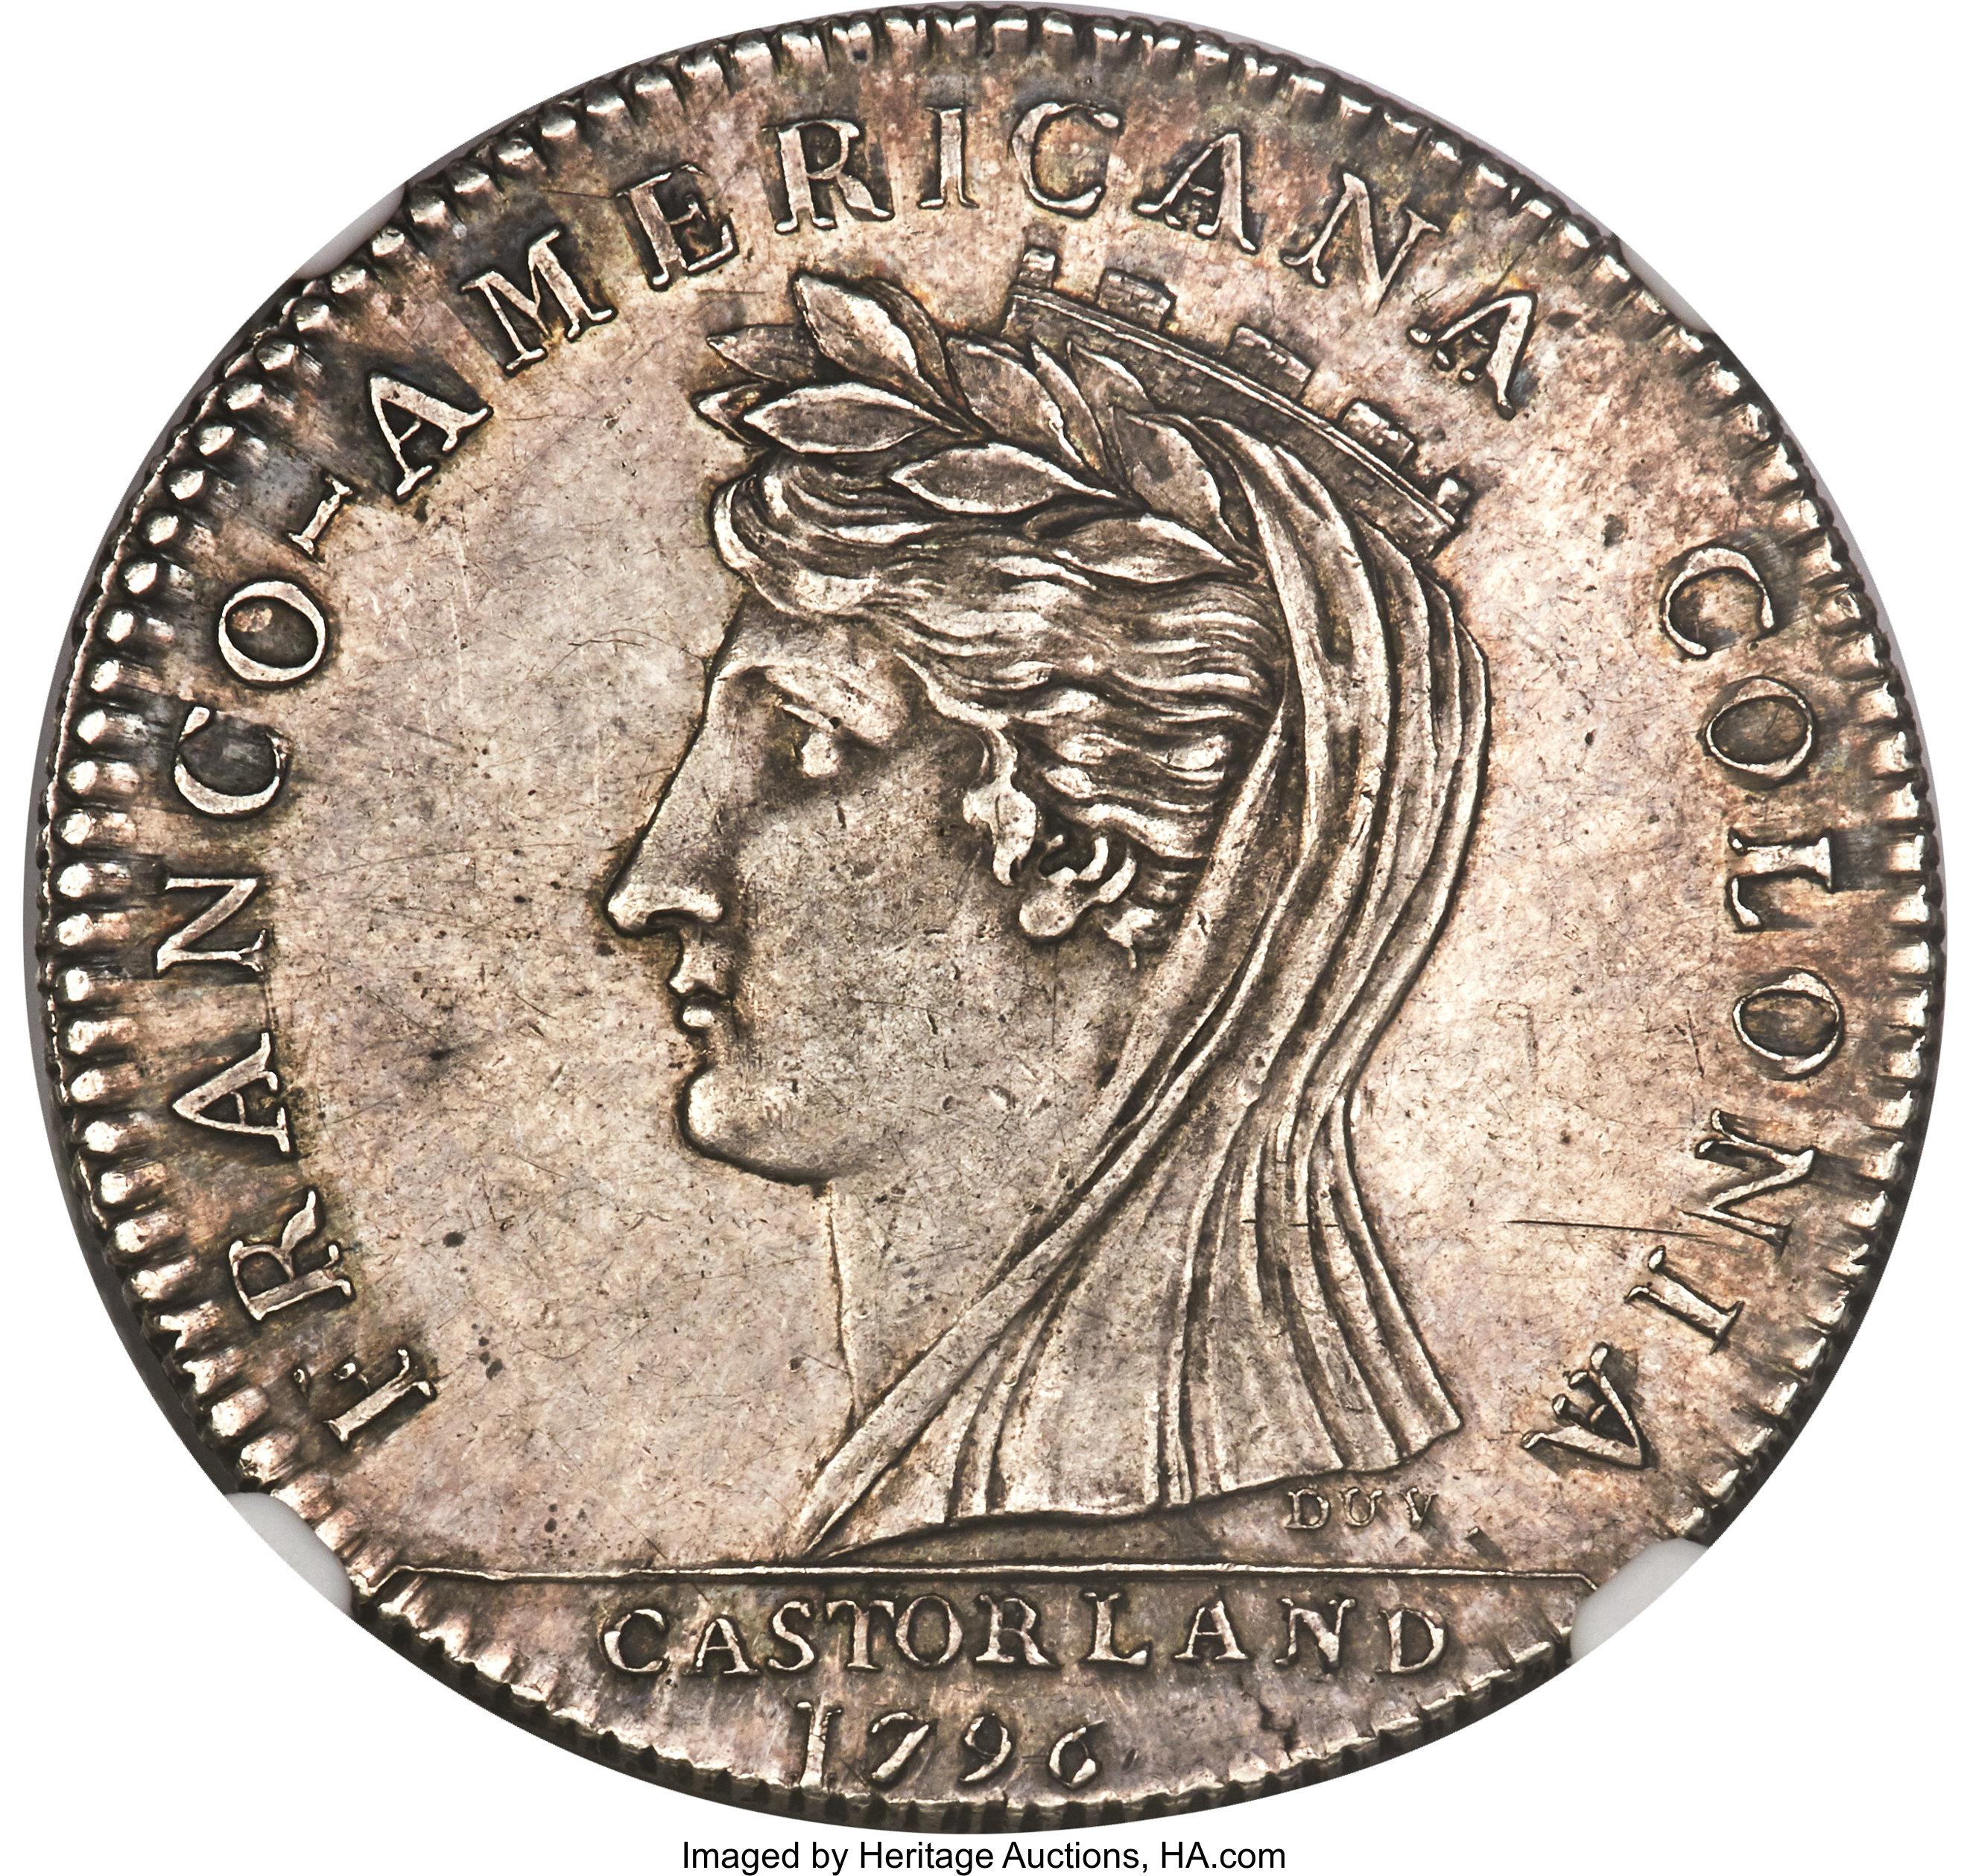 sample image for 1796 Castorland, Silver